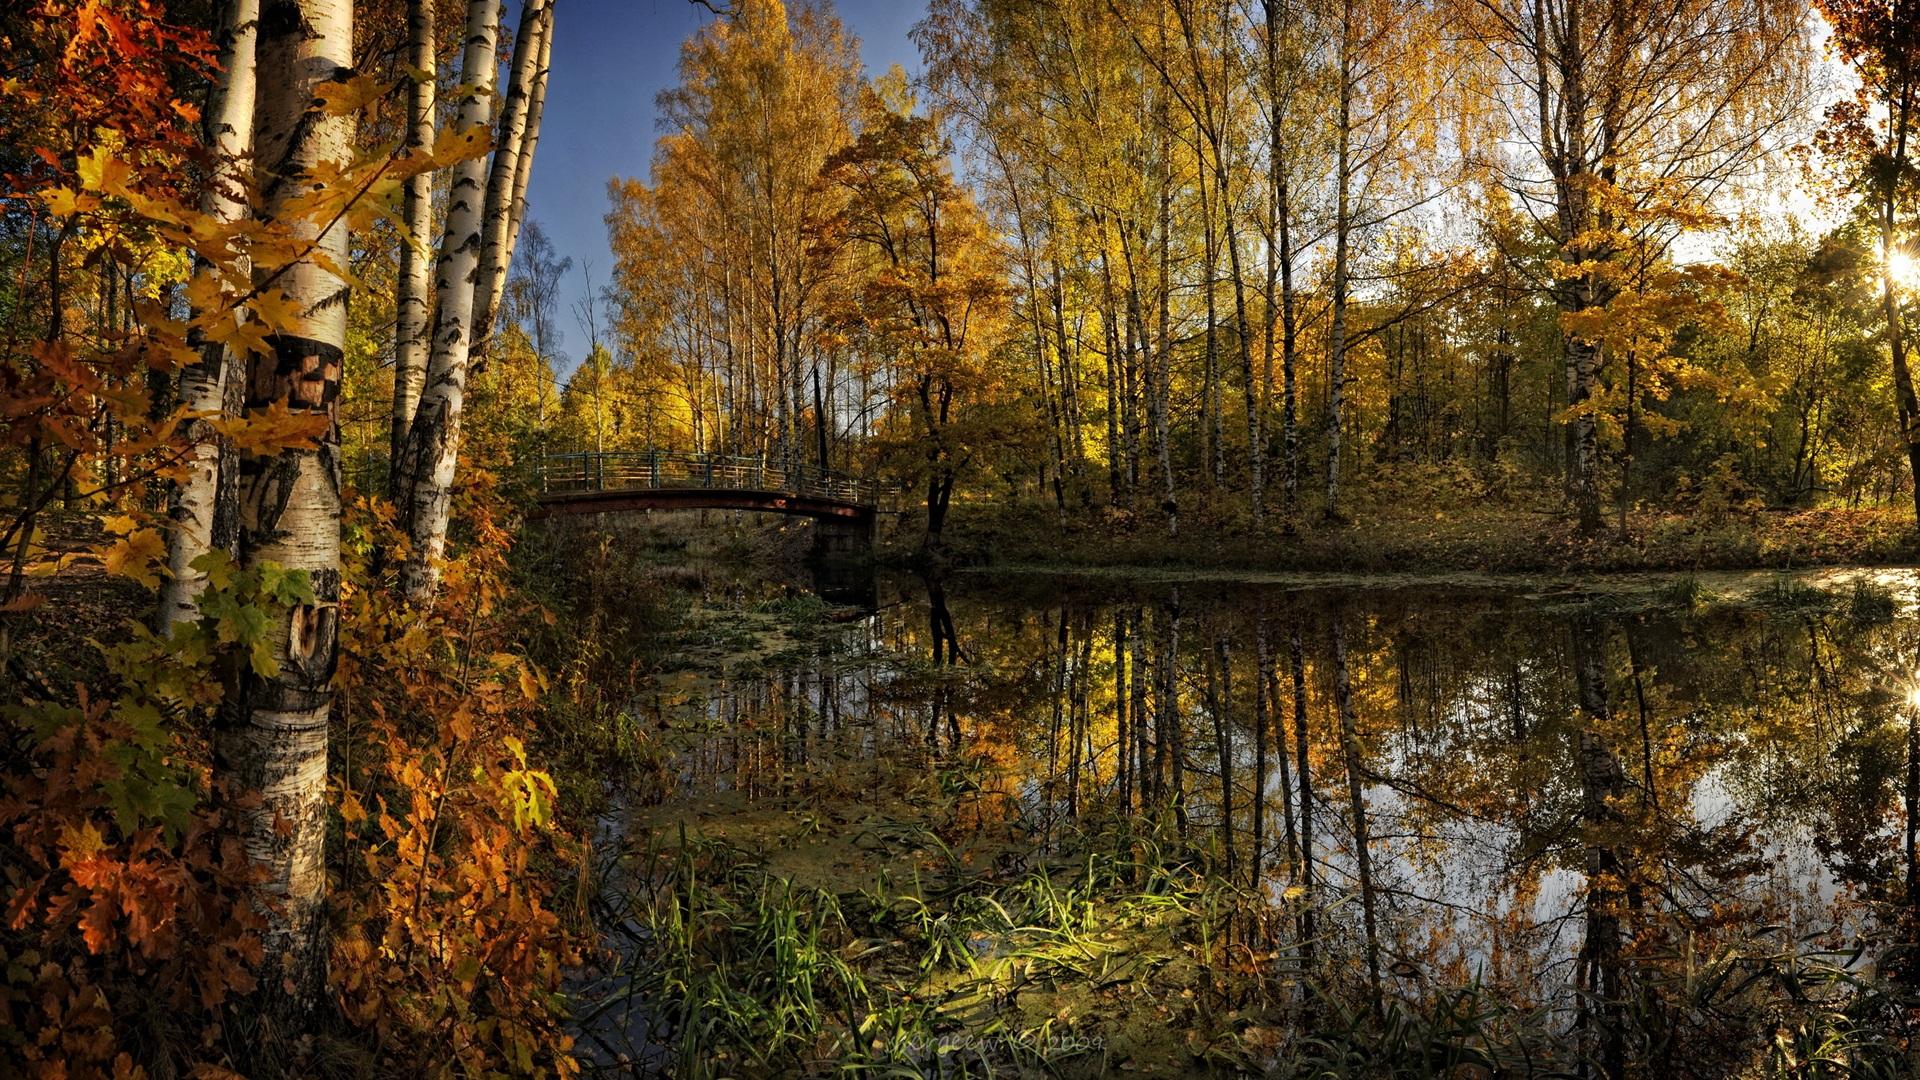 Nexus desktop wallpaper 1920x1080 nature wallpapersafari - Nature background 1920x1080 ...